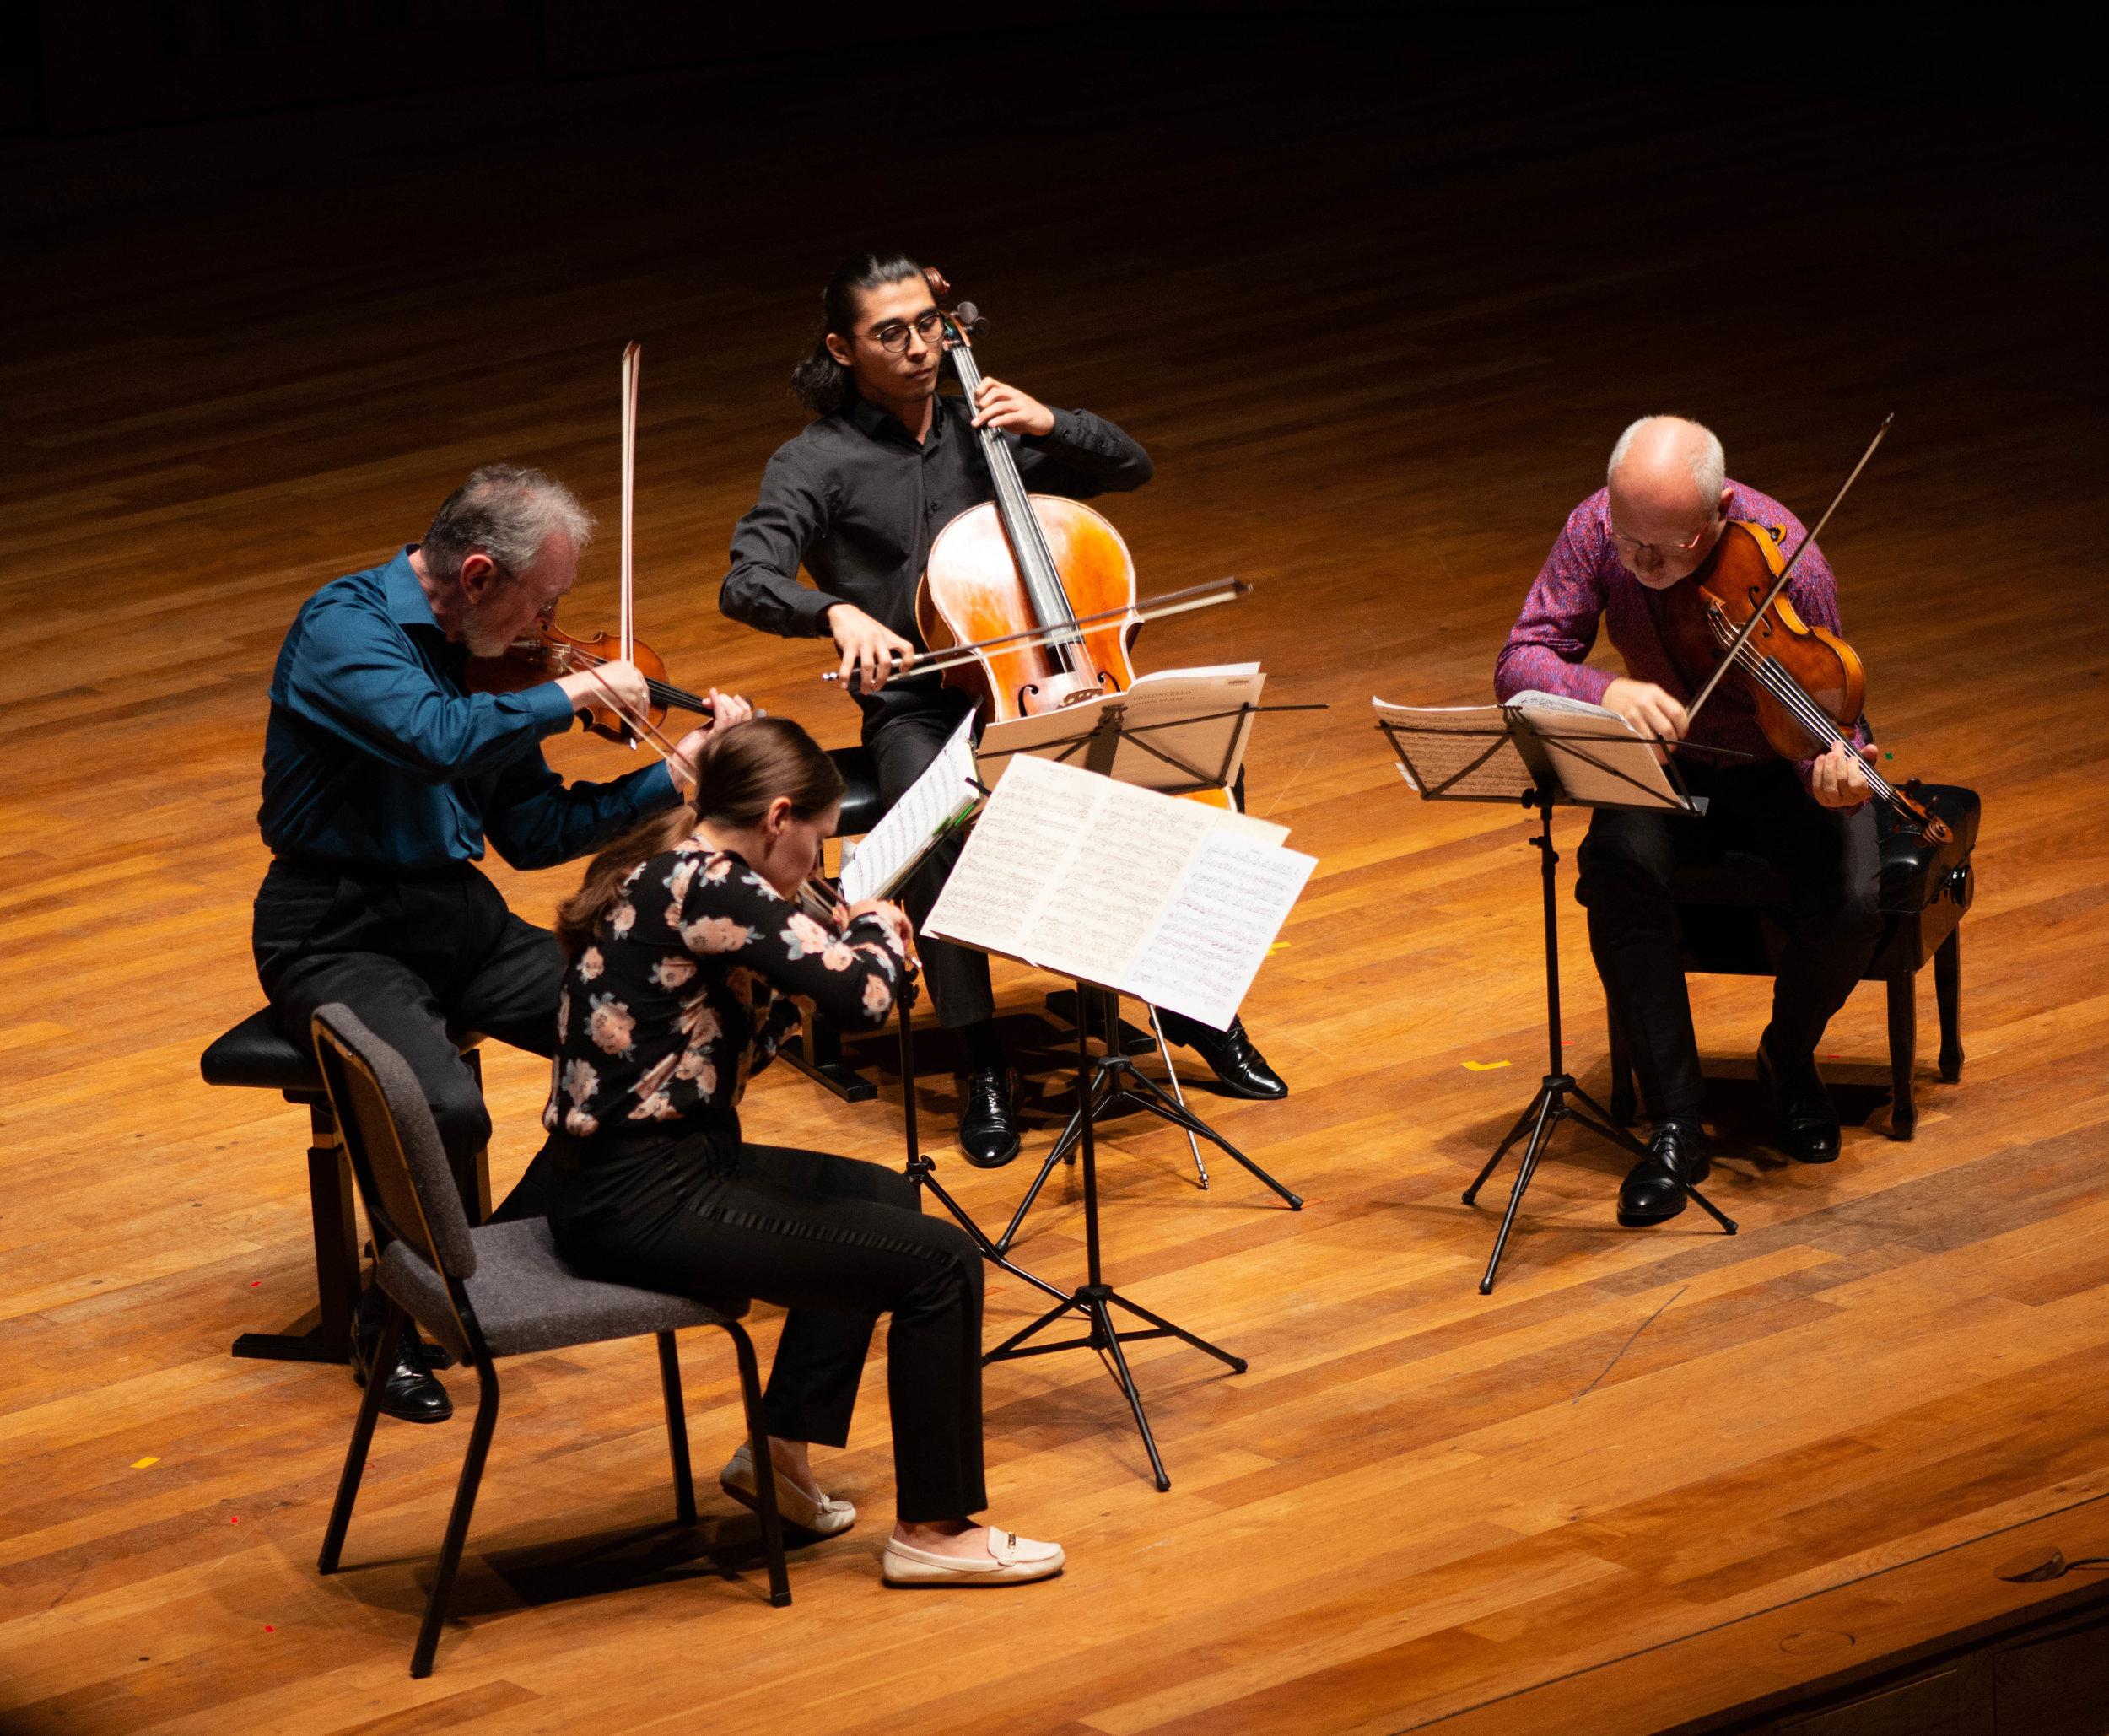 Jamshid playing with the Juilliard Quartet.